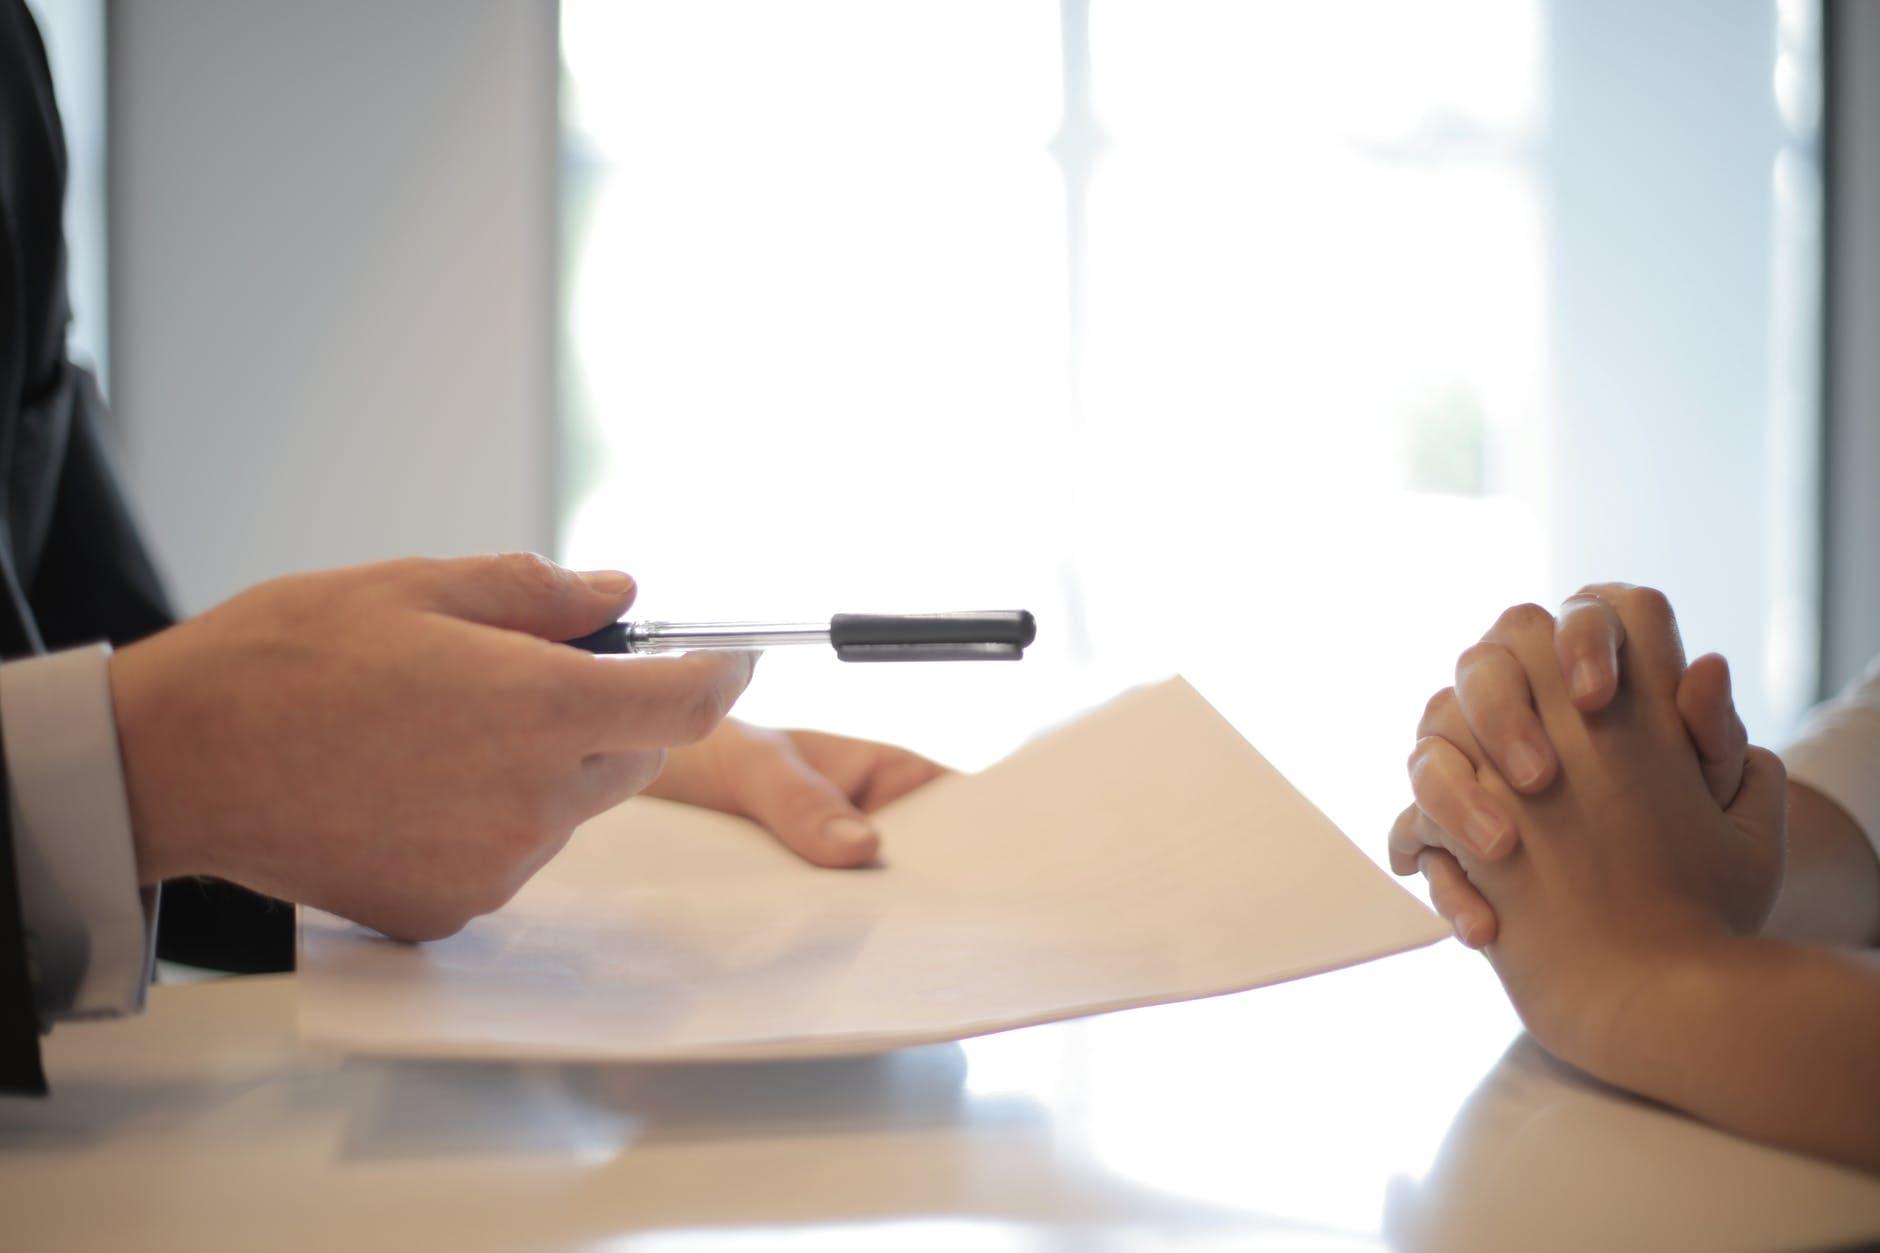 duracion-minima-contrato-alquiler-vivienda